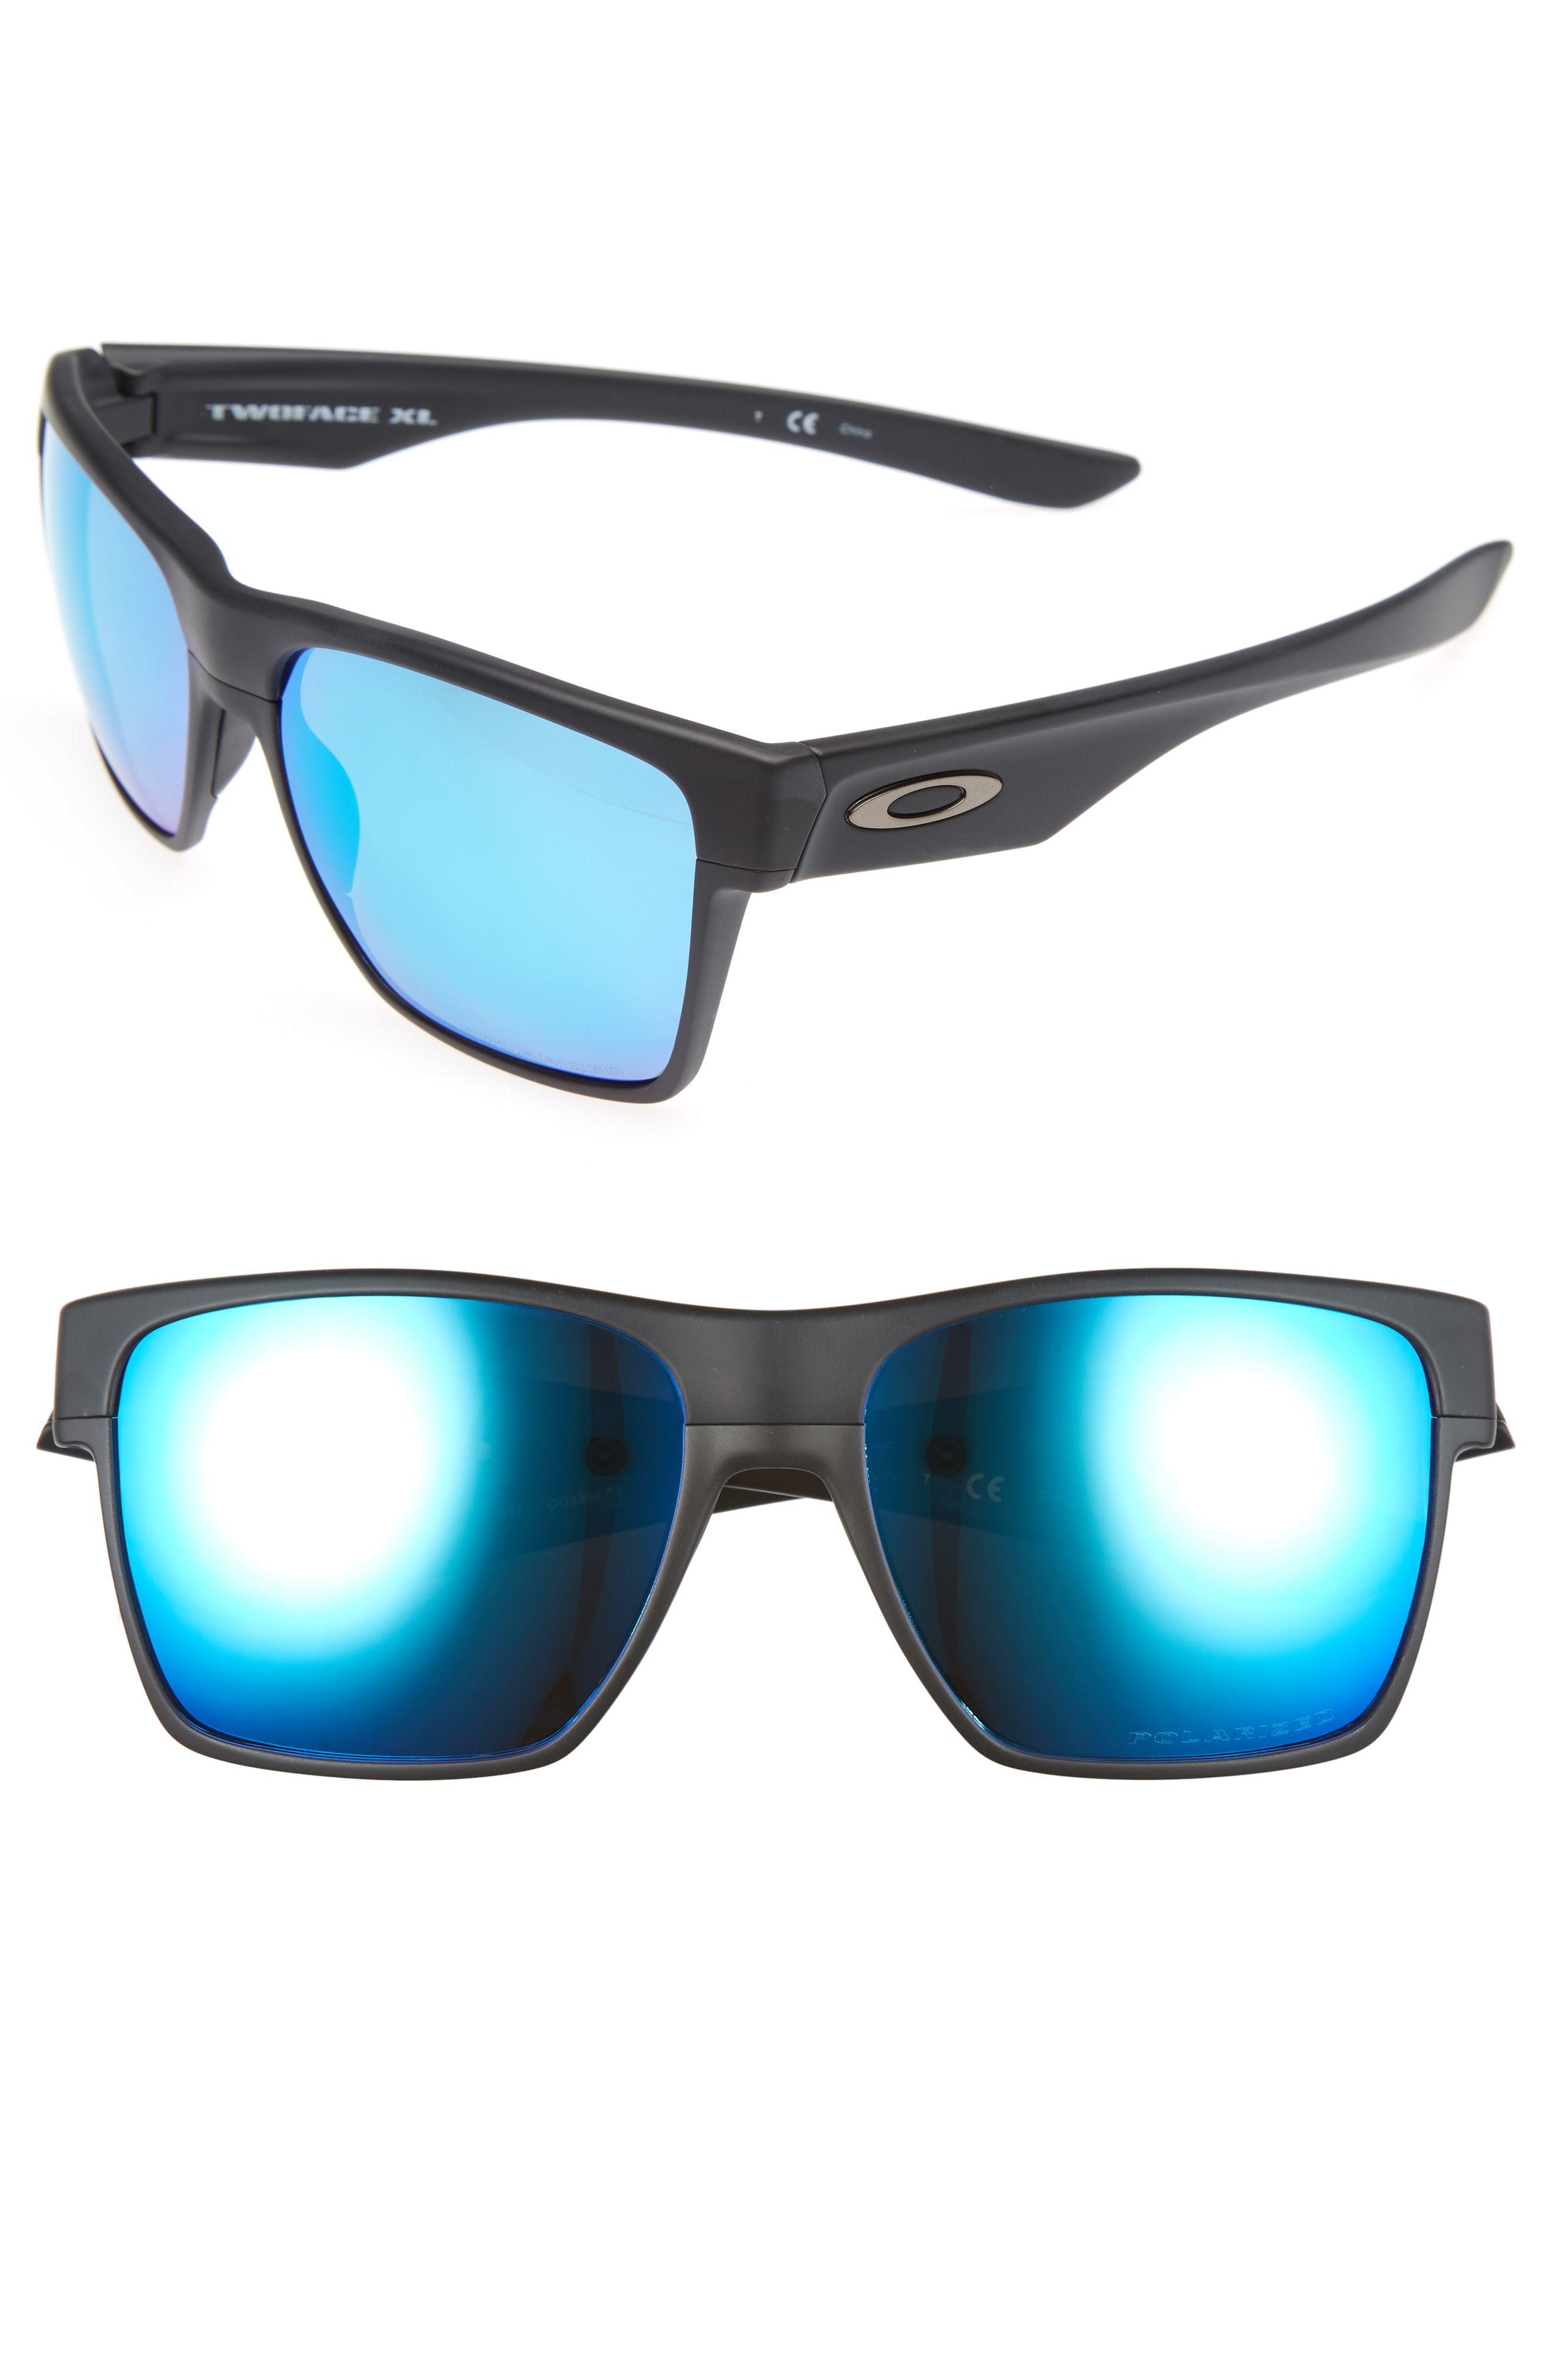 Oakley Twoface Xl 59mm Polarized Sunglasses 5a6aa04180a